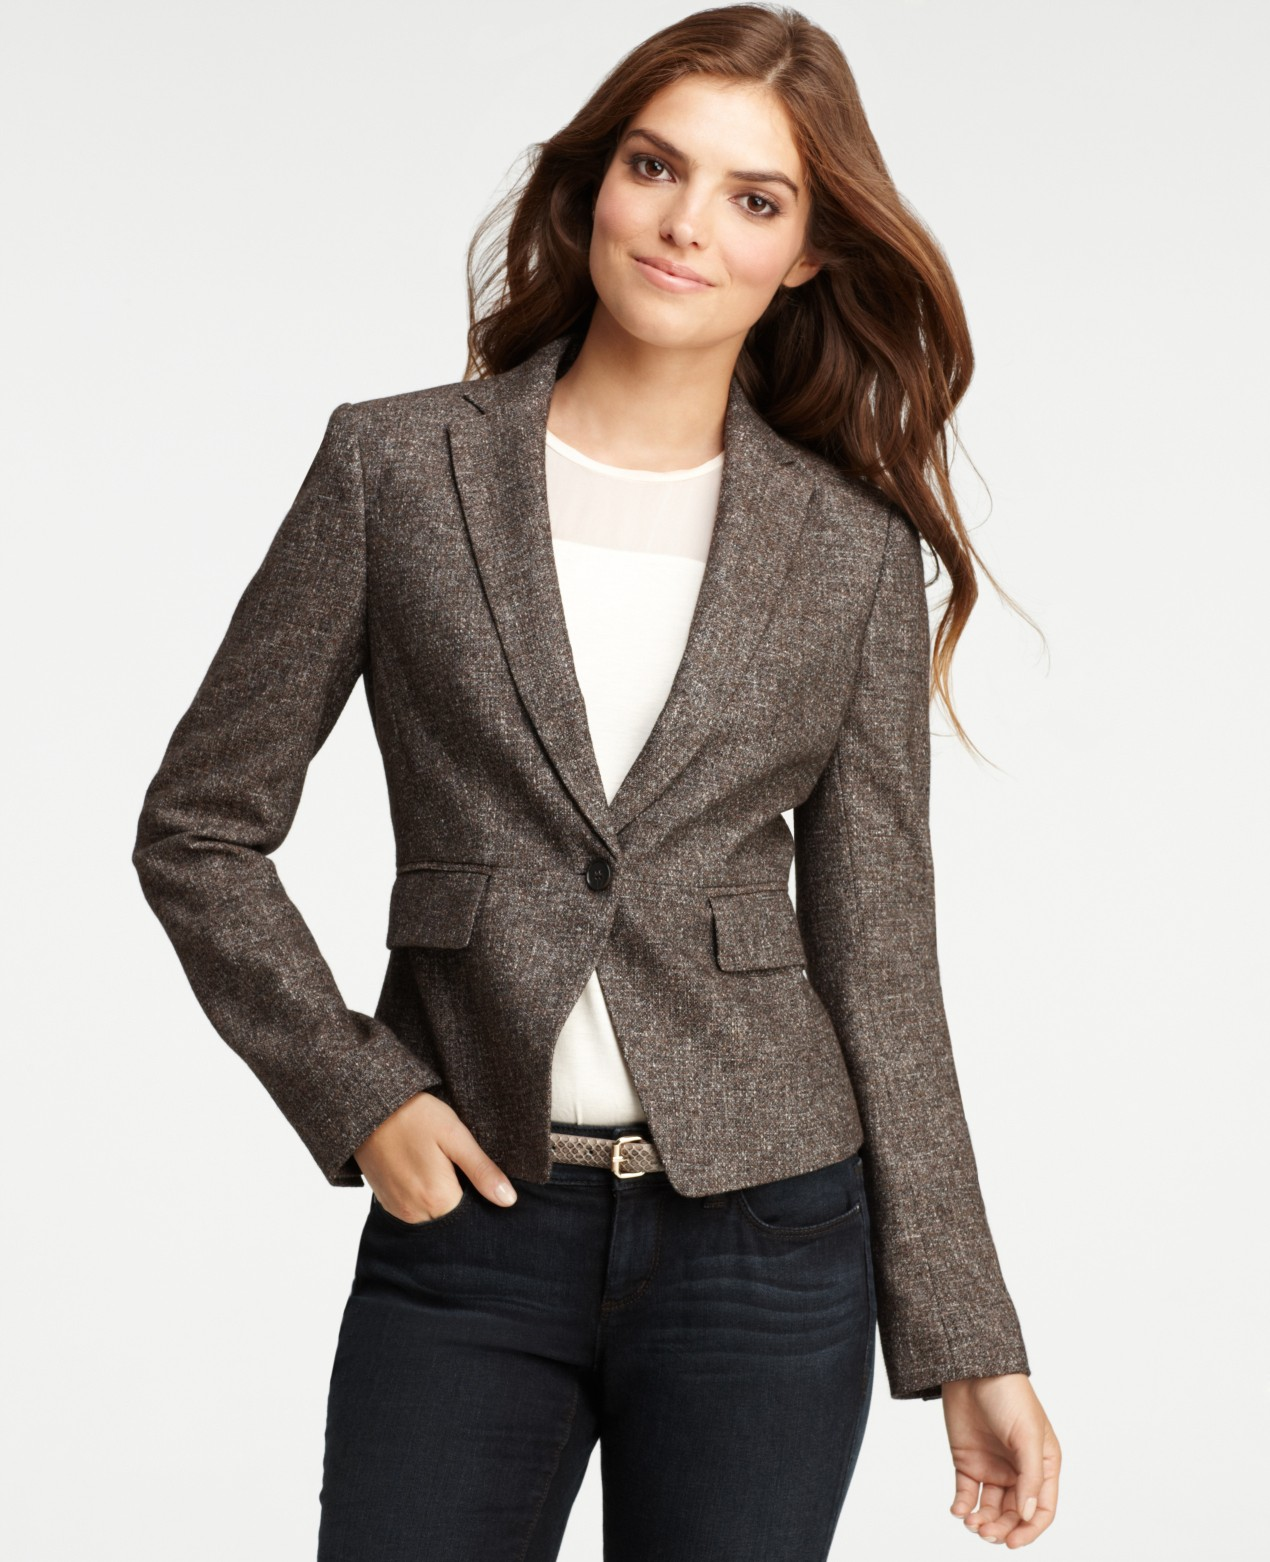 veste blaser femme excellent veste blazer fashion femme paule clout maelysse couleur marron. Black Bedroom Furniture Sets. Home Design Ideas